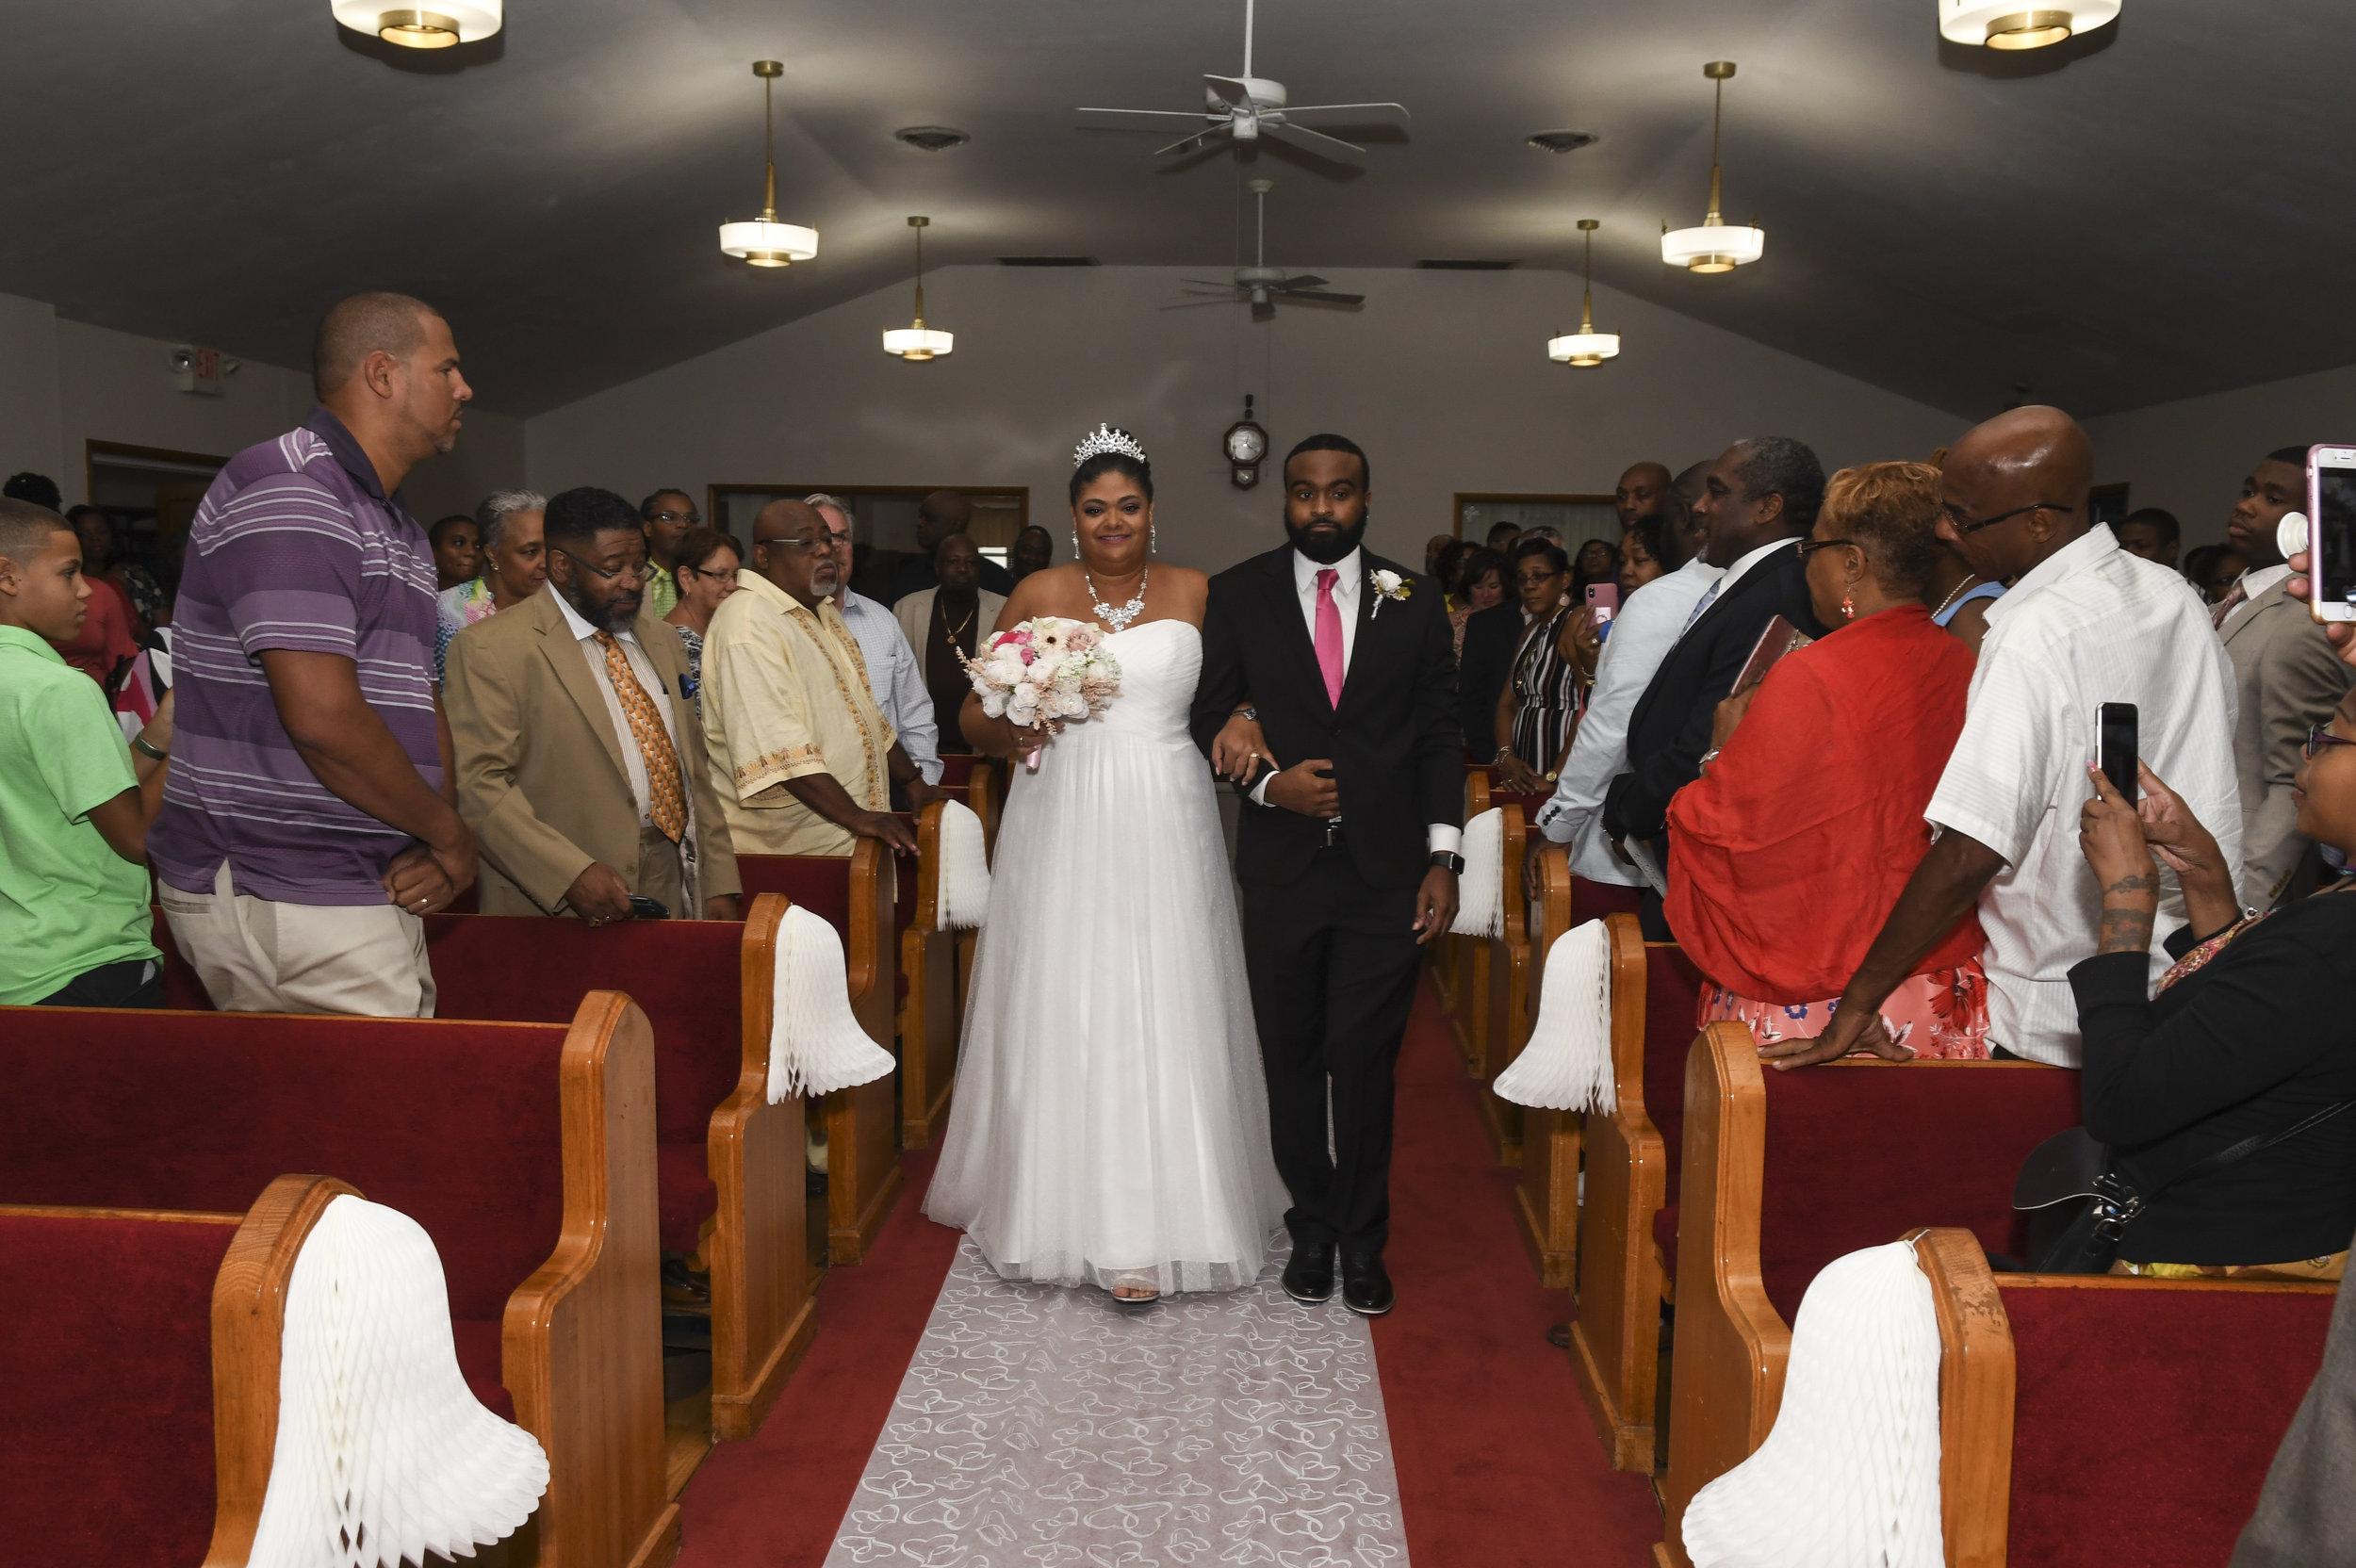 2018 09.01.18 Robin and Buck's Wedding  Felix Bryant Photography, LLC  ©201820180901_0047.jpg